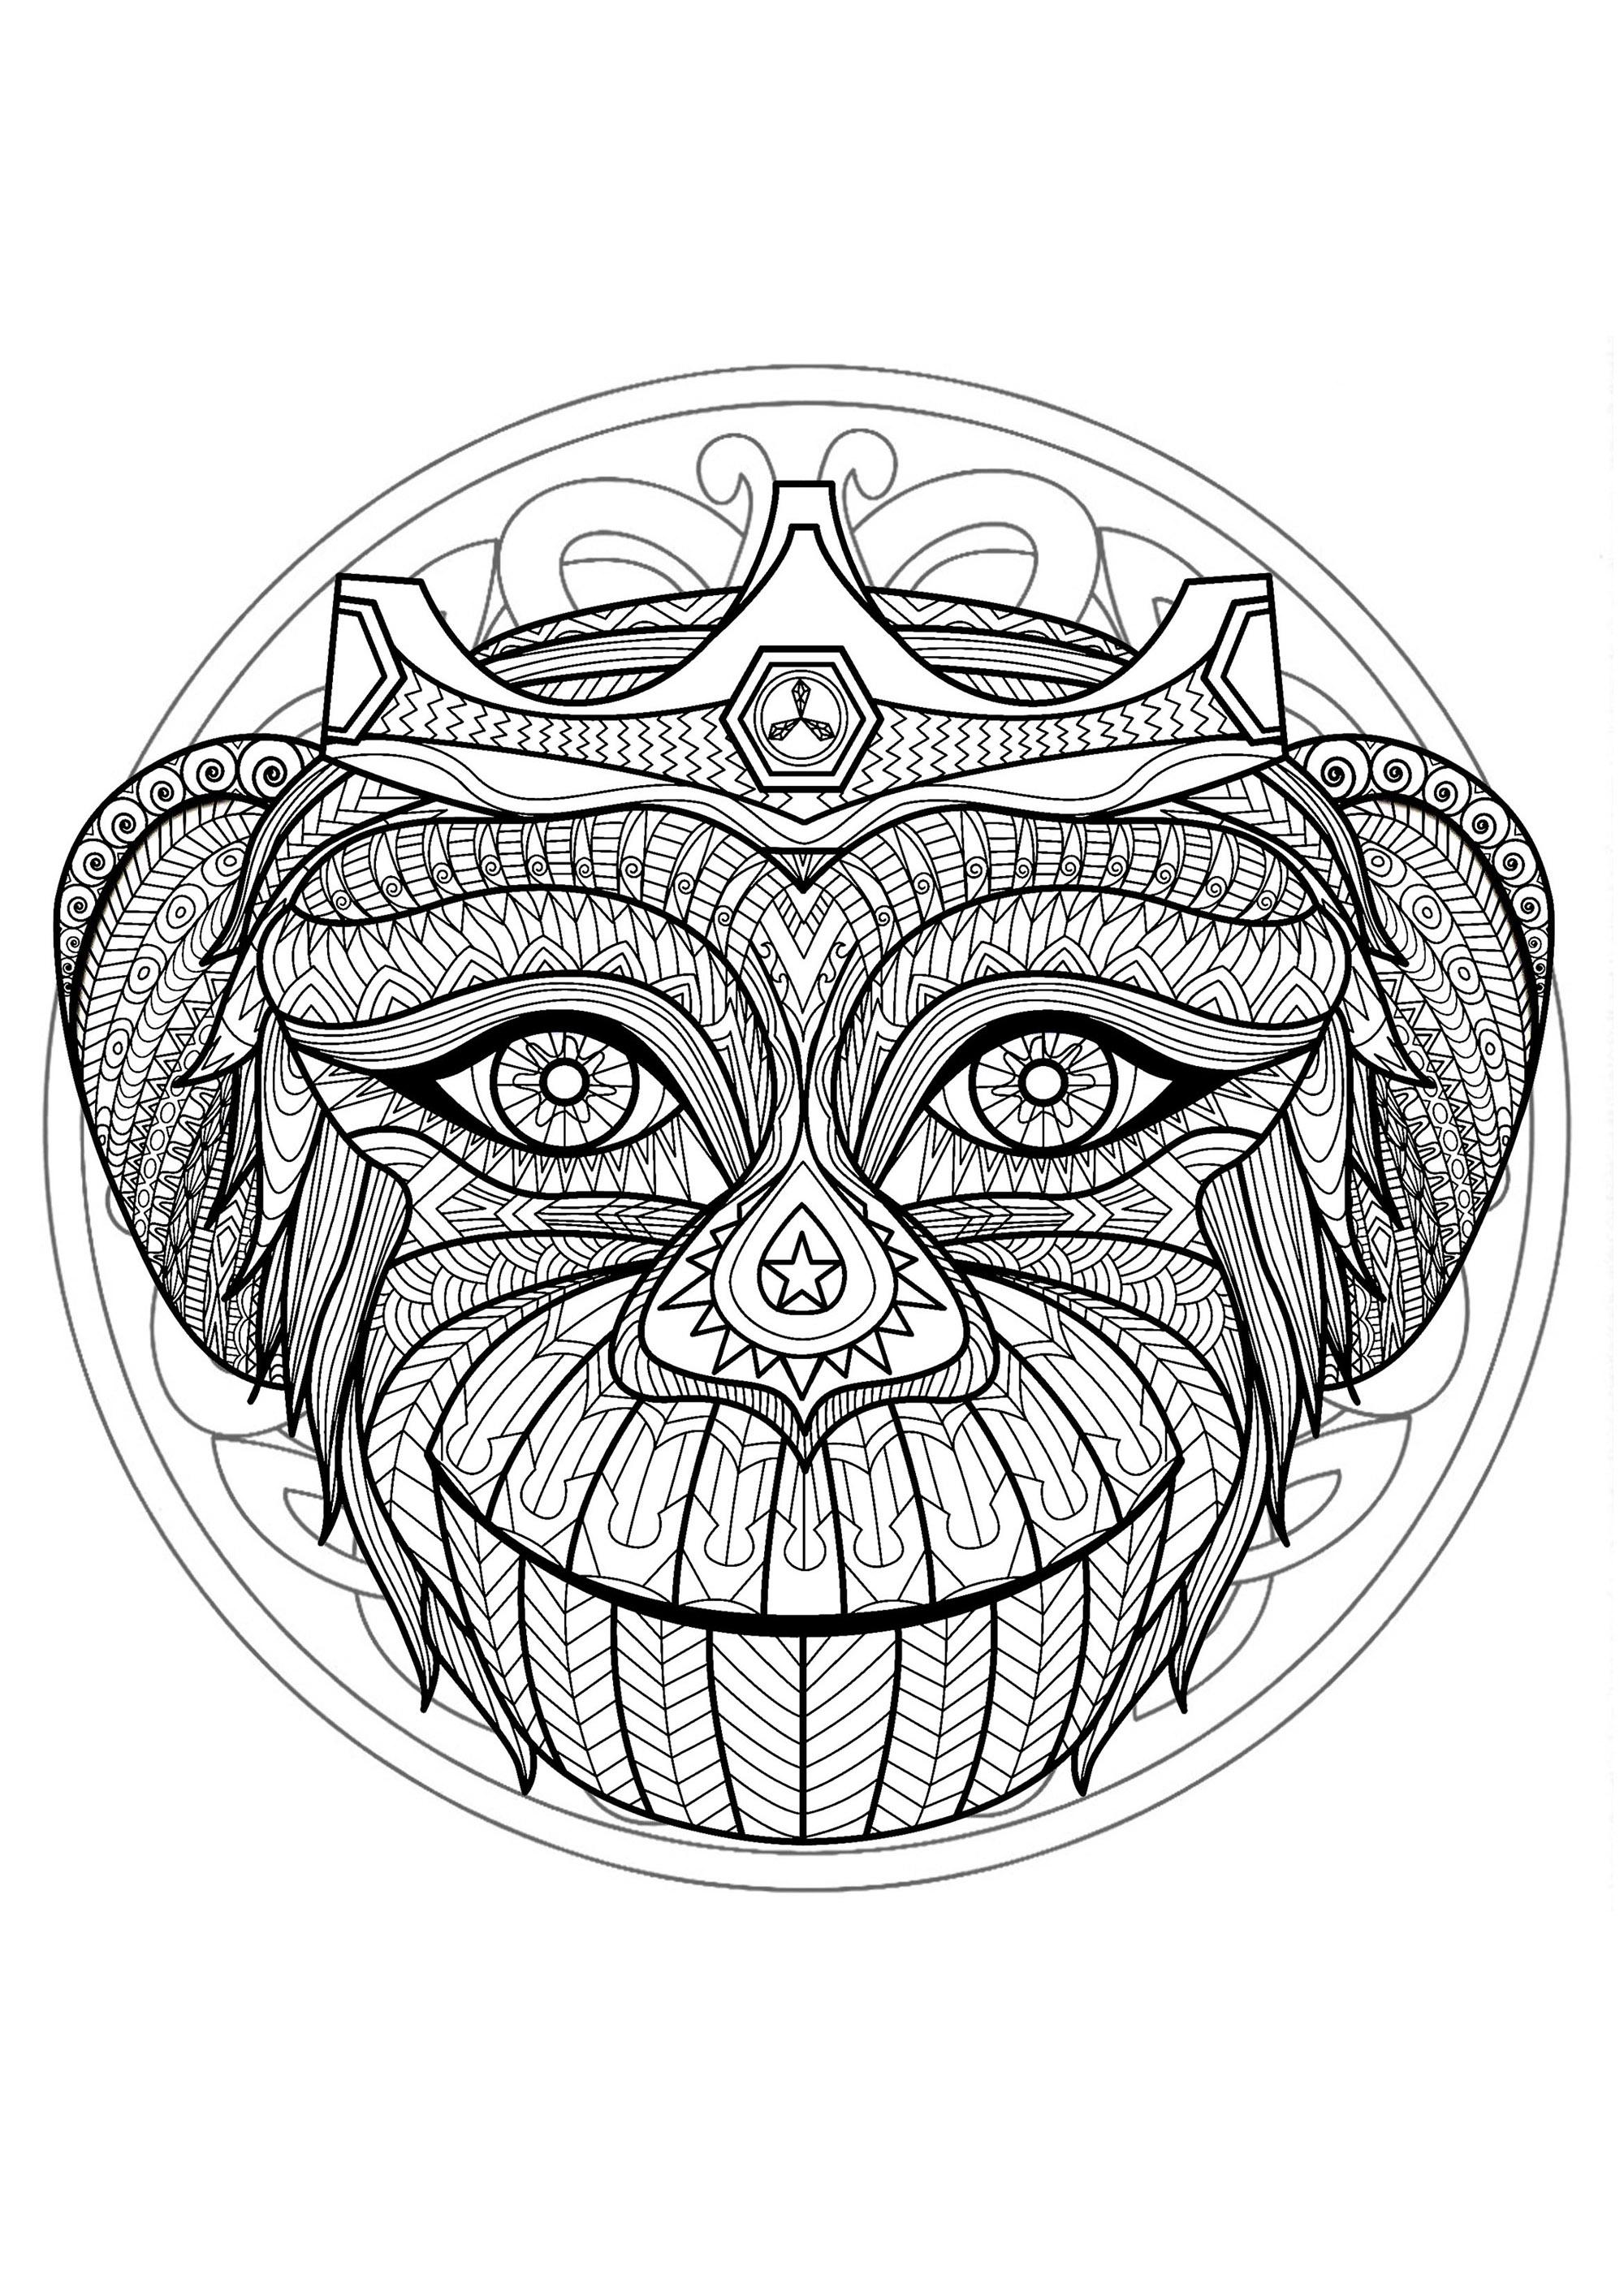 Mandala Tete Singe 1 Mandalas Coloriages Difficiles